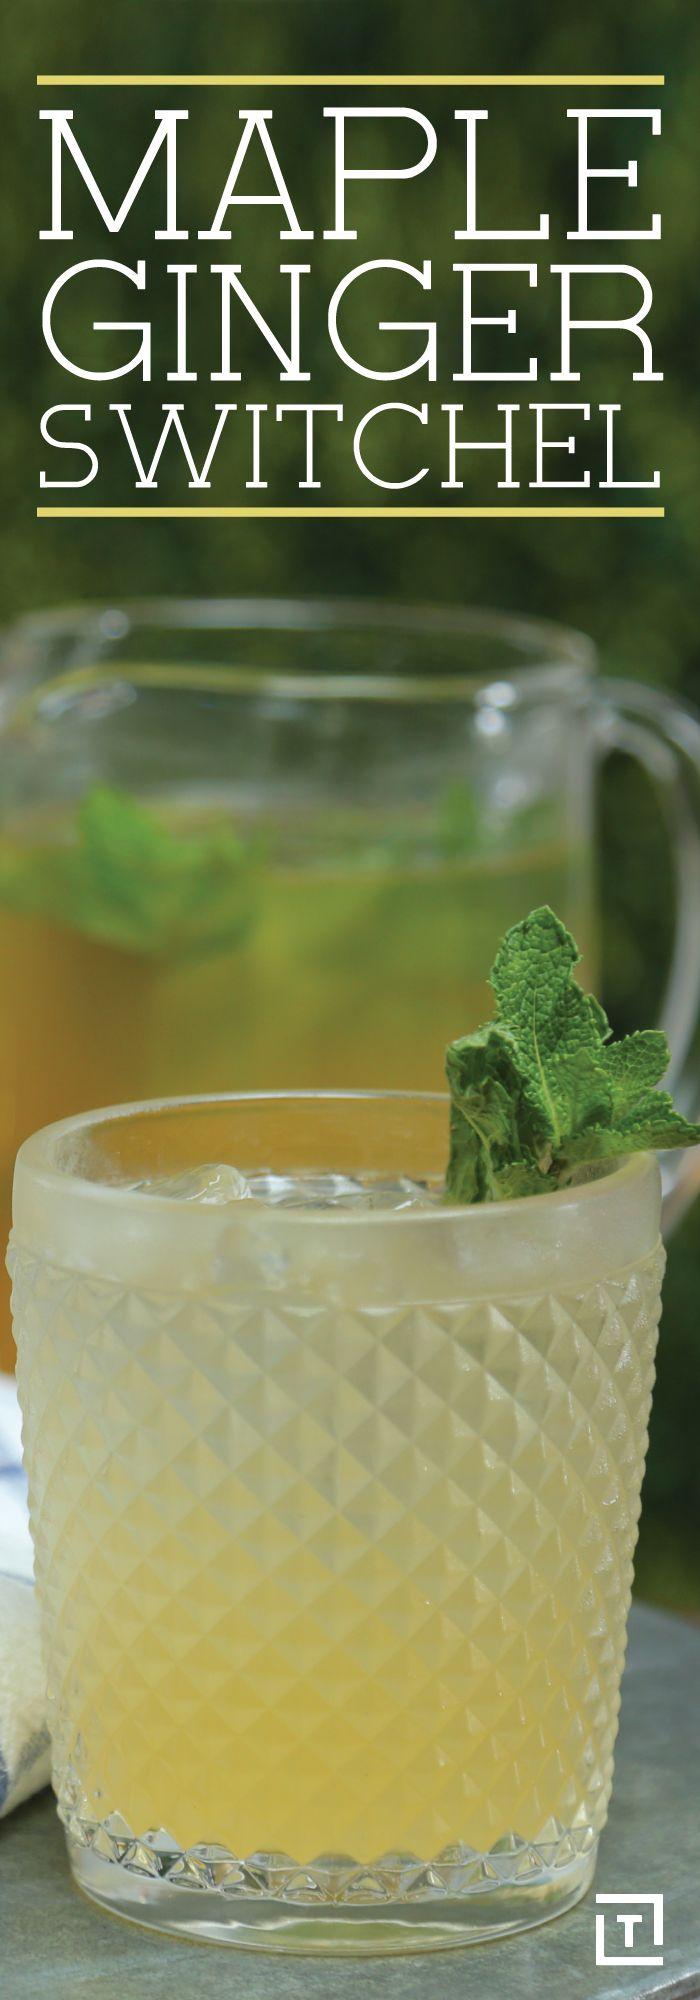 Best 25 drink mixer ideas on pinterest for Fun fall drinks